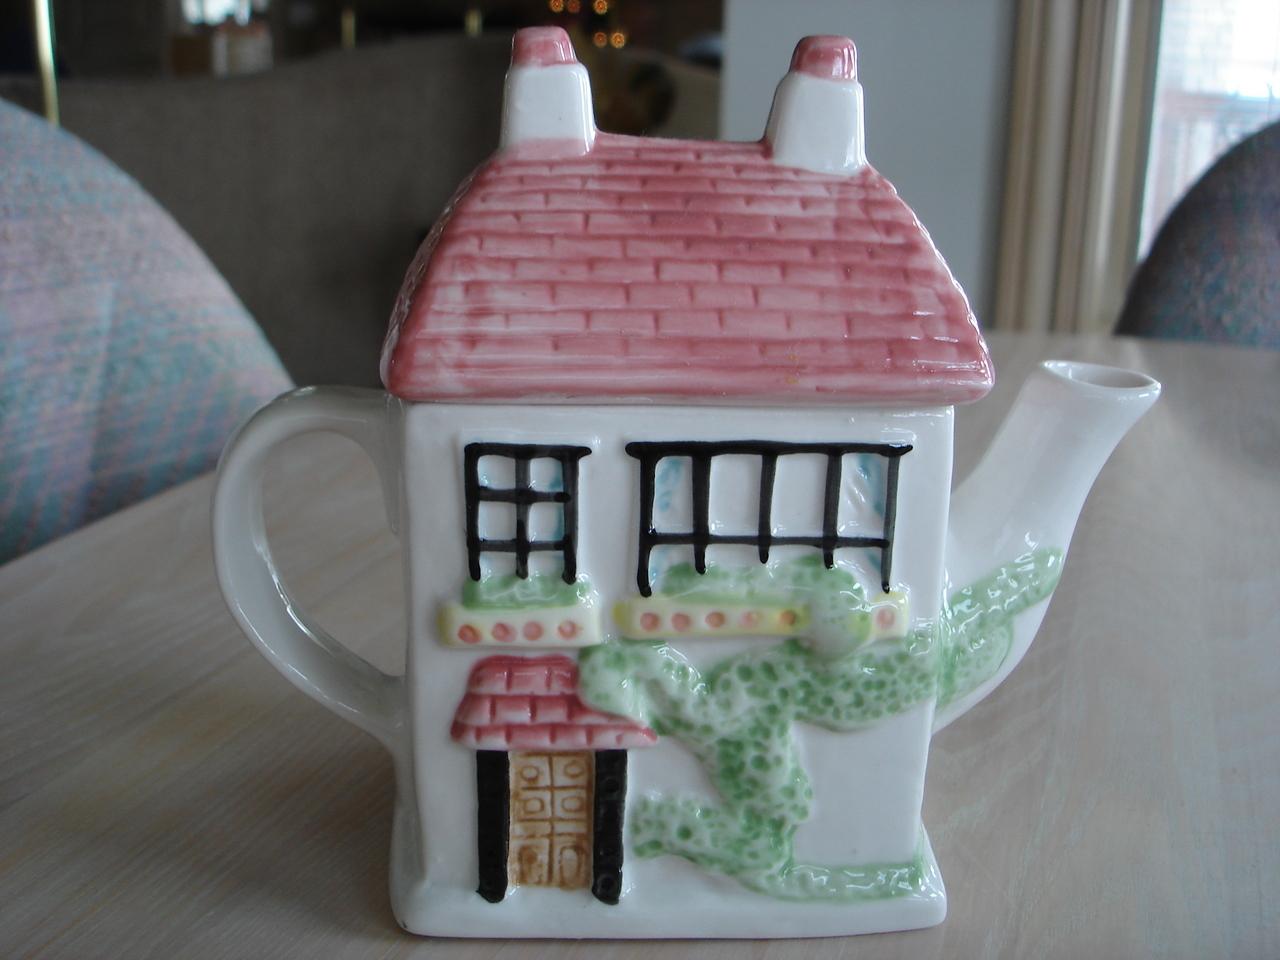 House Teapot, Ceramic, 3D Design, Roof Lid